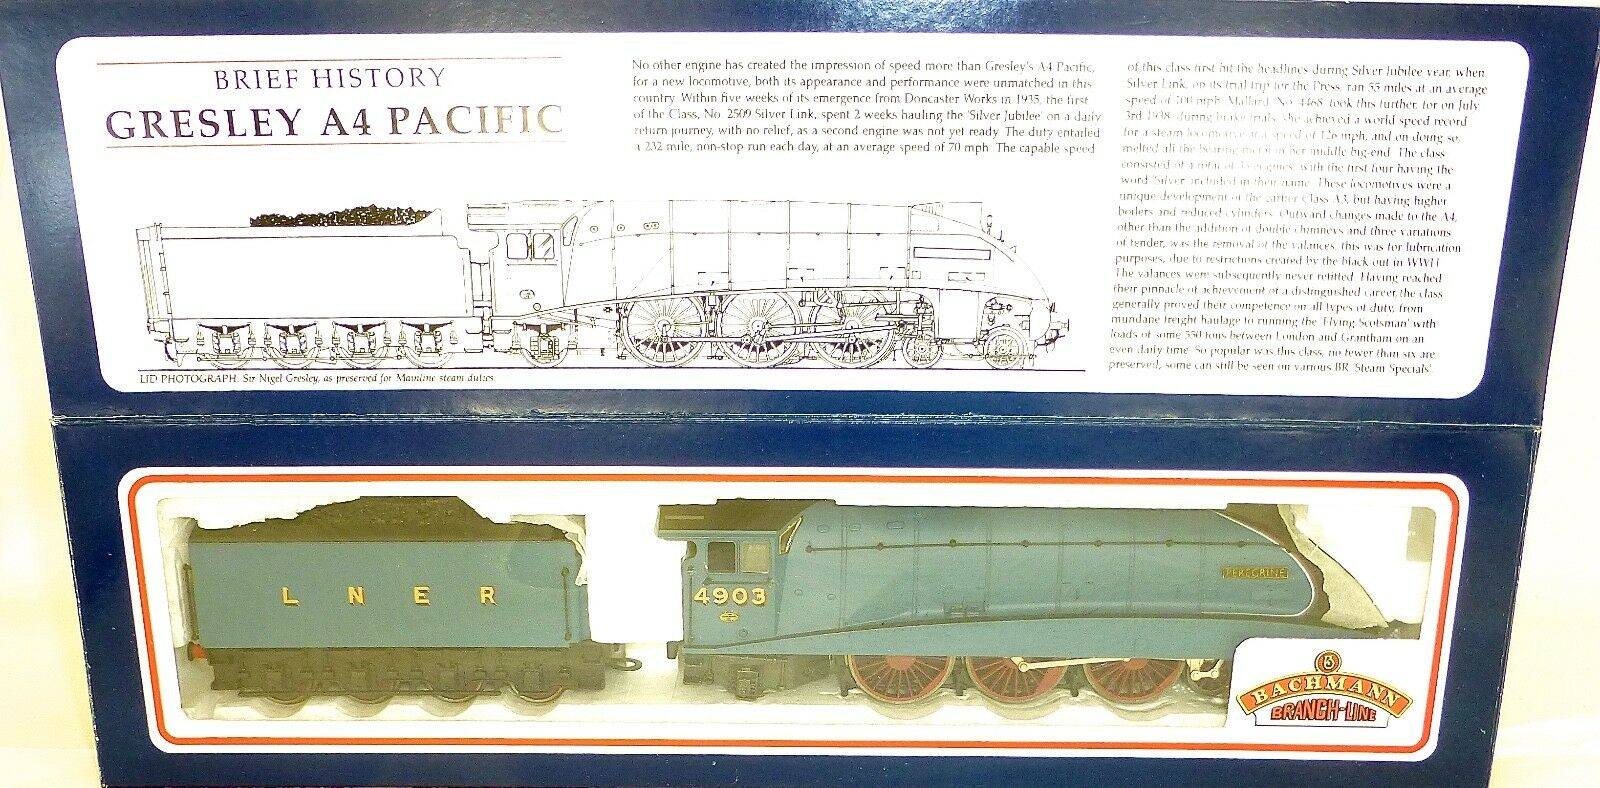 Hornby 31-952 a4 L.N. E.R. Peregrine 4-6-2 locomotiva 4903 blu 00 1:87 ka3 Å *